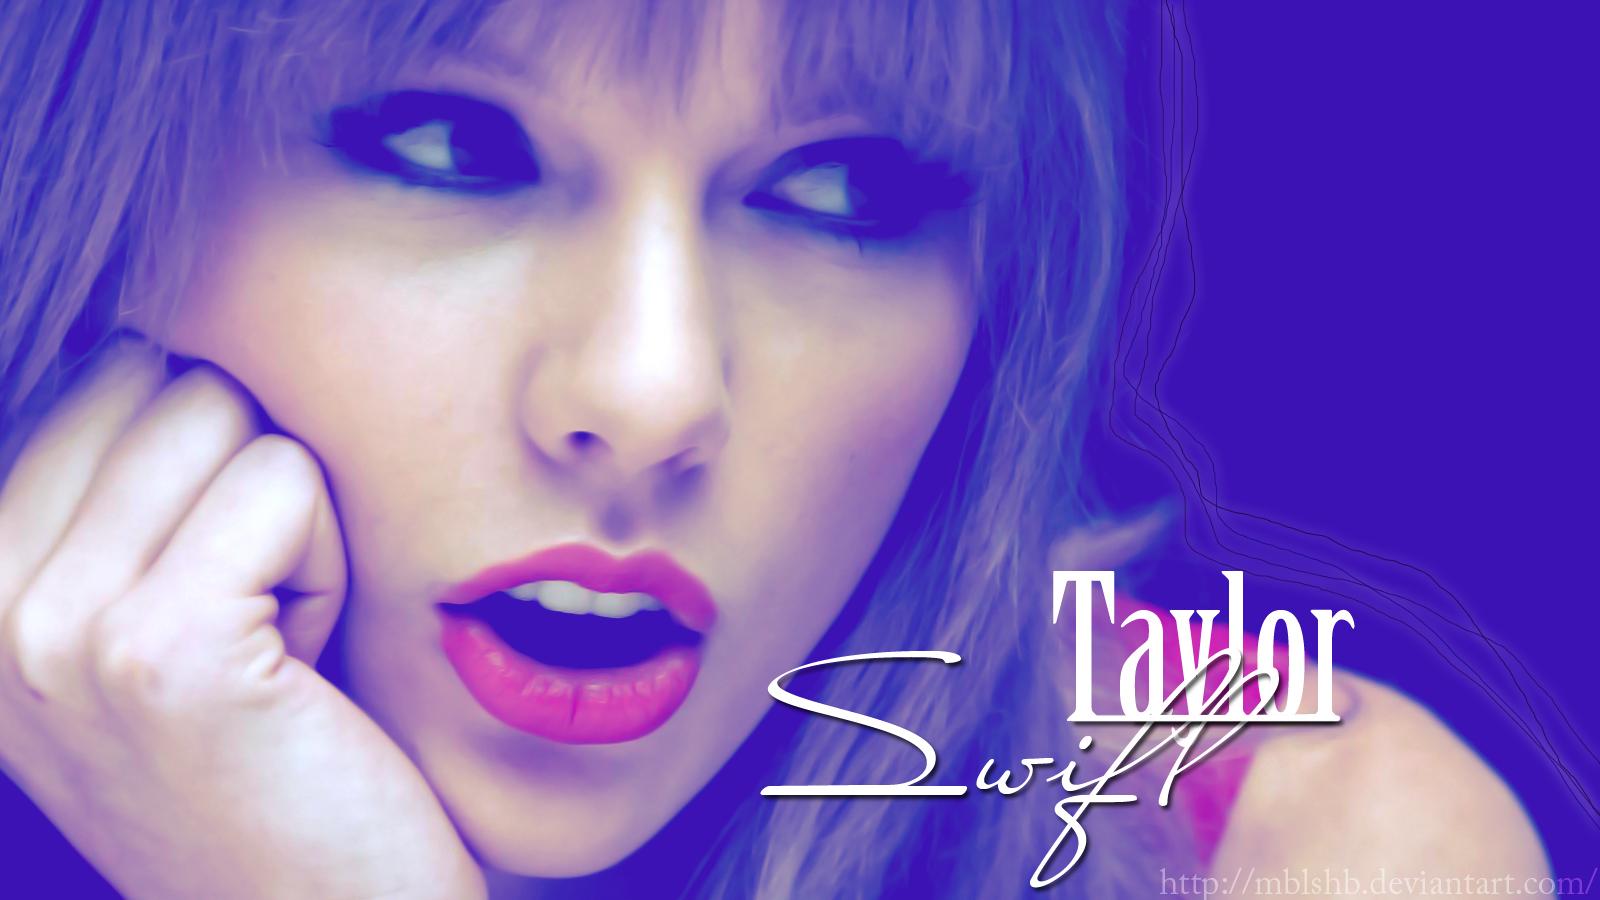 Taylor Swift wallpaper 1600x900 42041